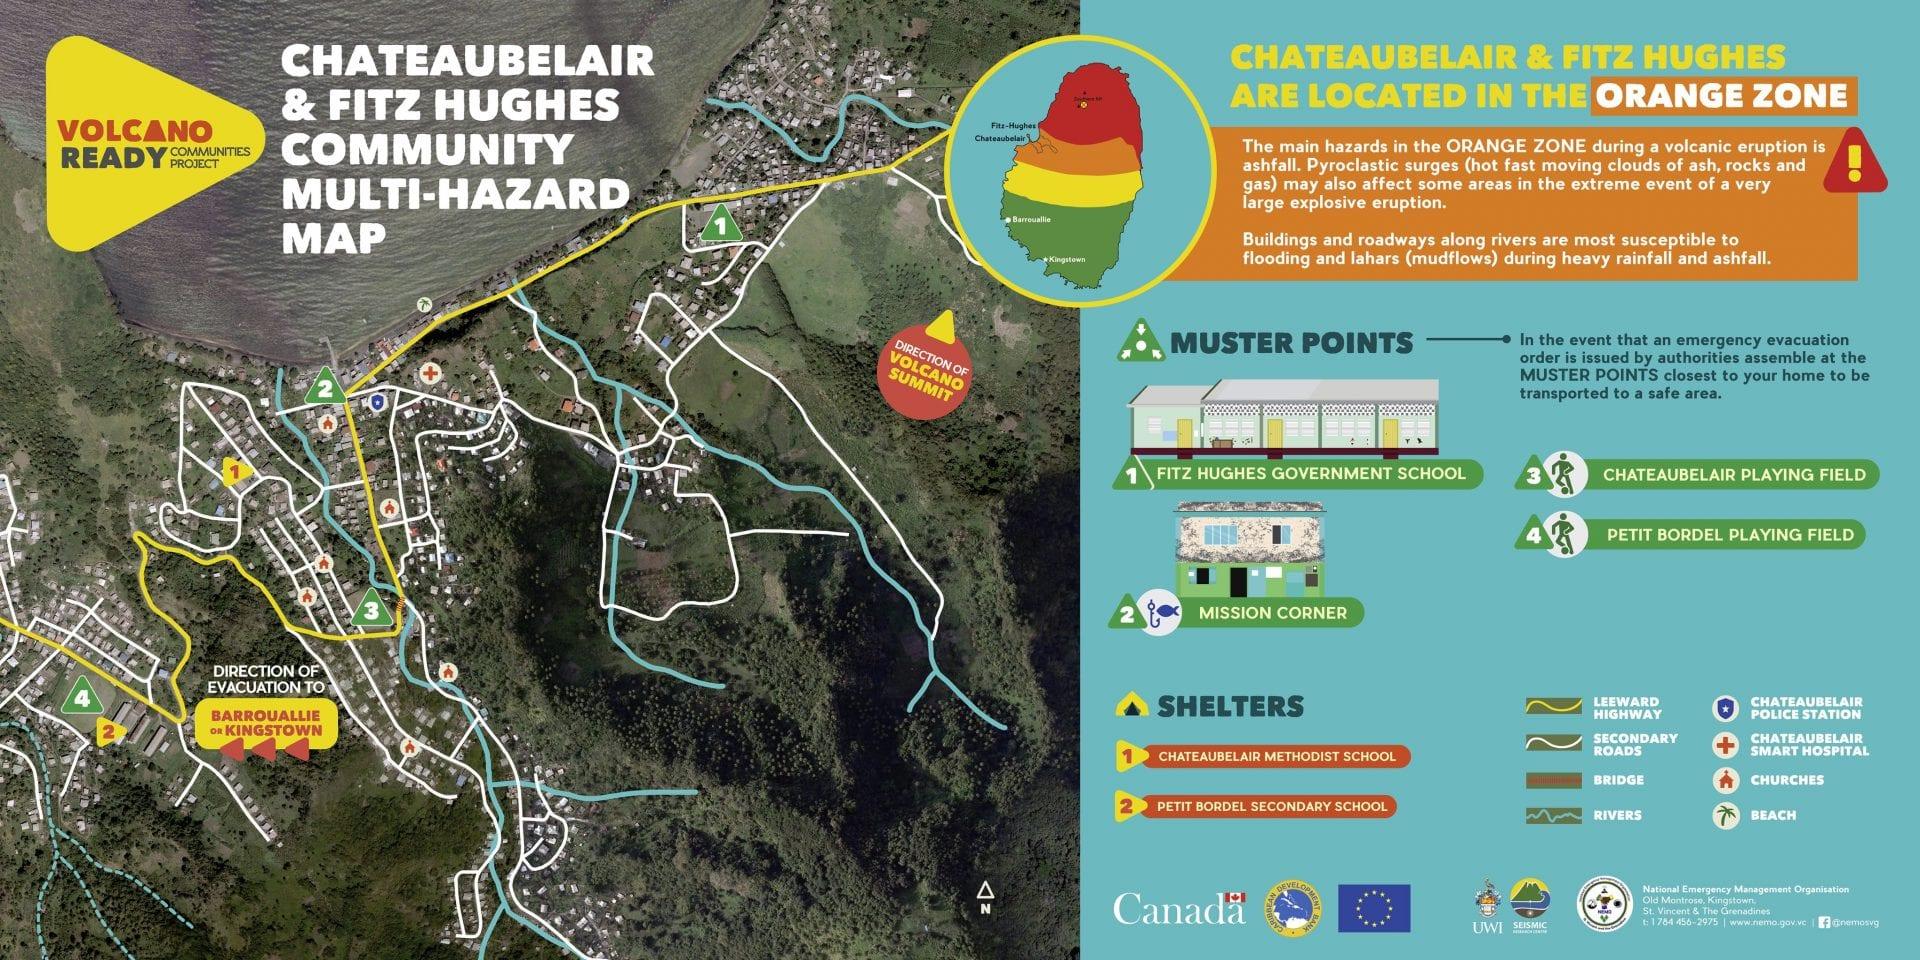 st Vincent grenadines caribbean evacuates volcano